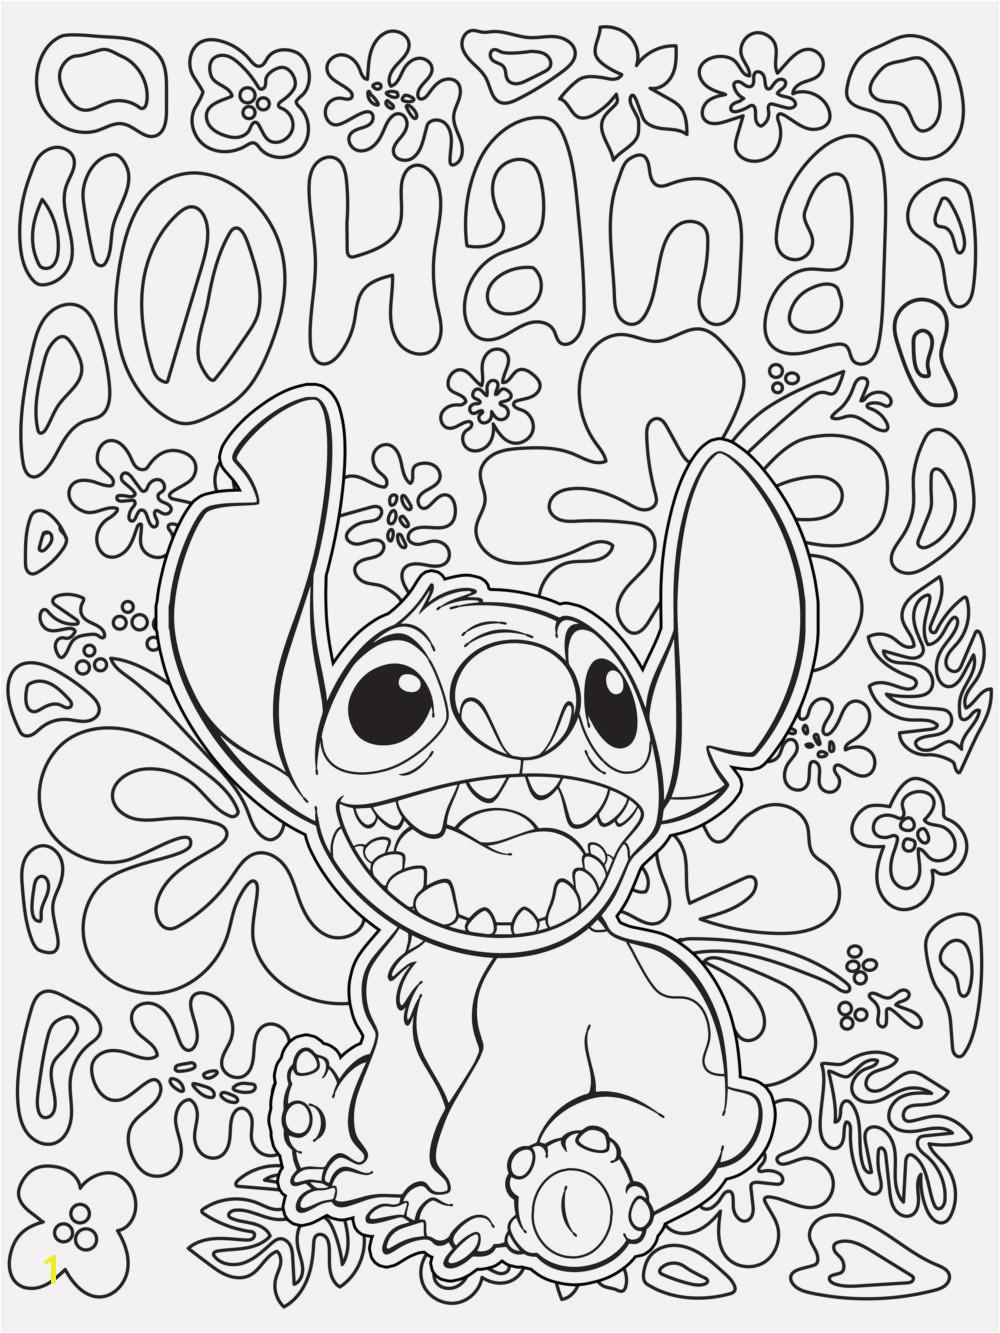 Kawaii Coloring Pages Free Printable Kawaii Coloring Pages Awesome Kawaii Coloring Pages Od Fruits – Fun